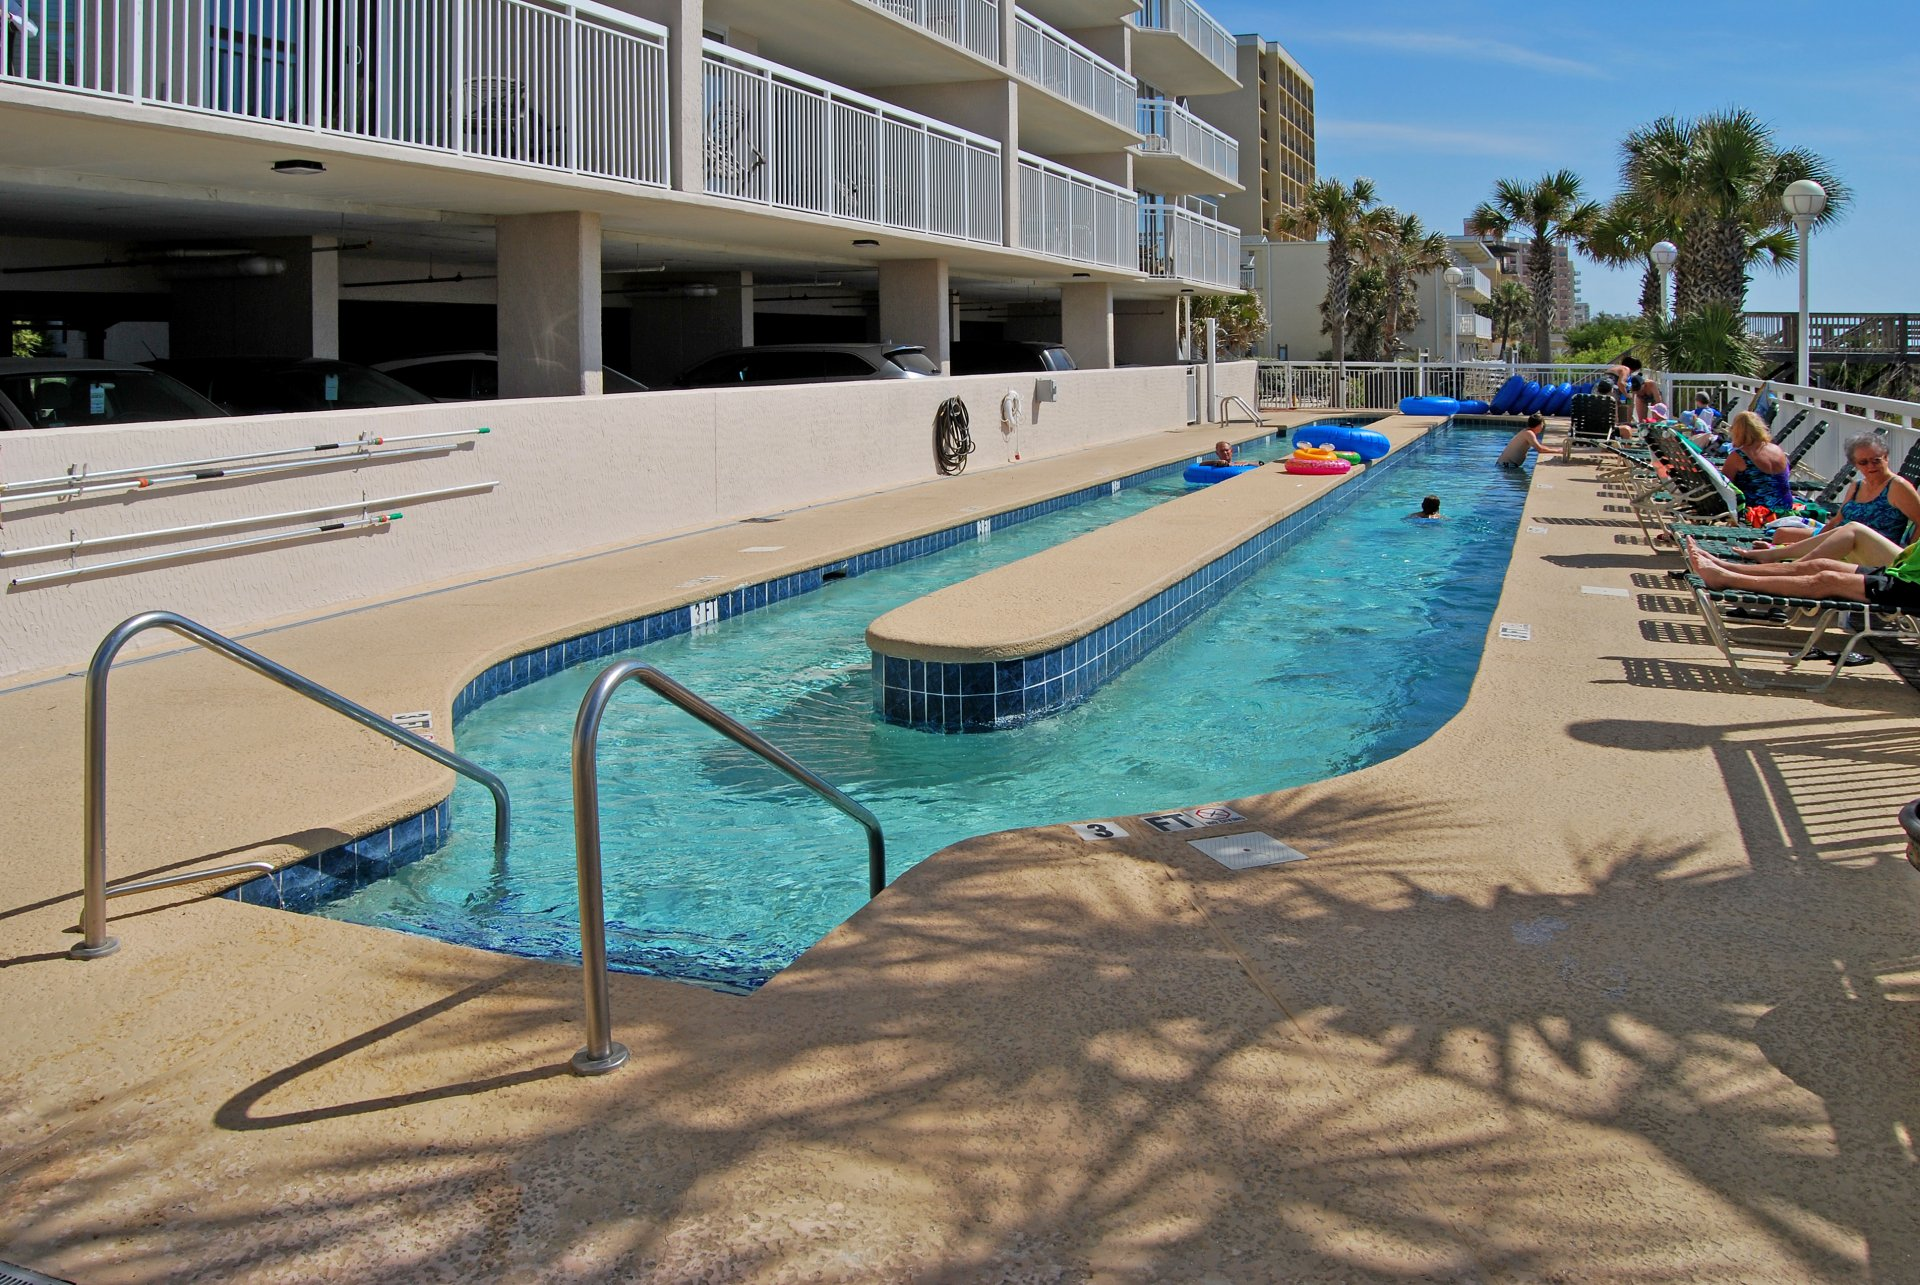 Crescent Shores Condos For Rent North Myrtle Beach Vacation Rentals